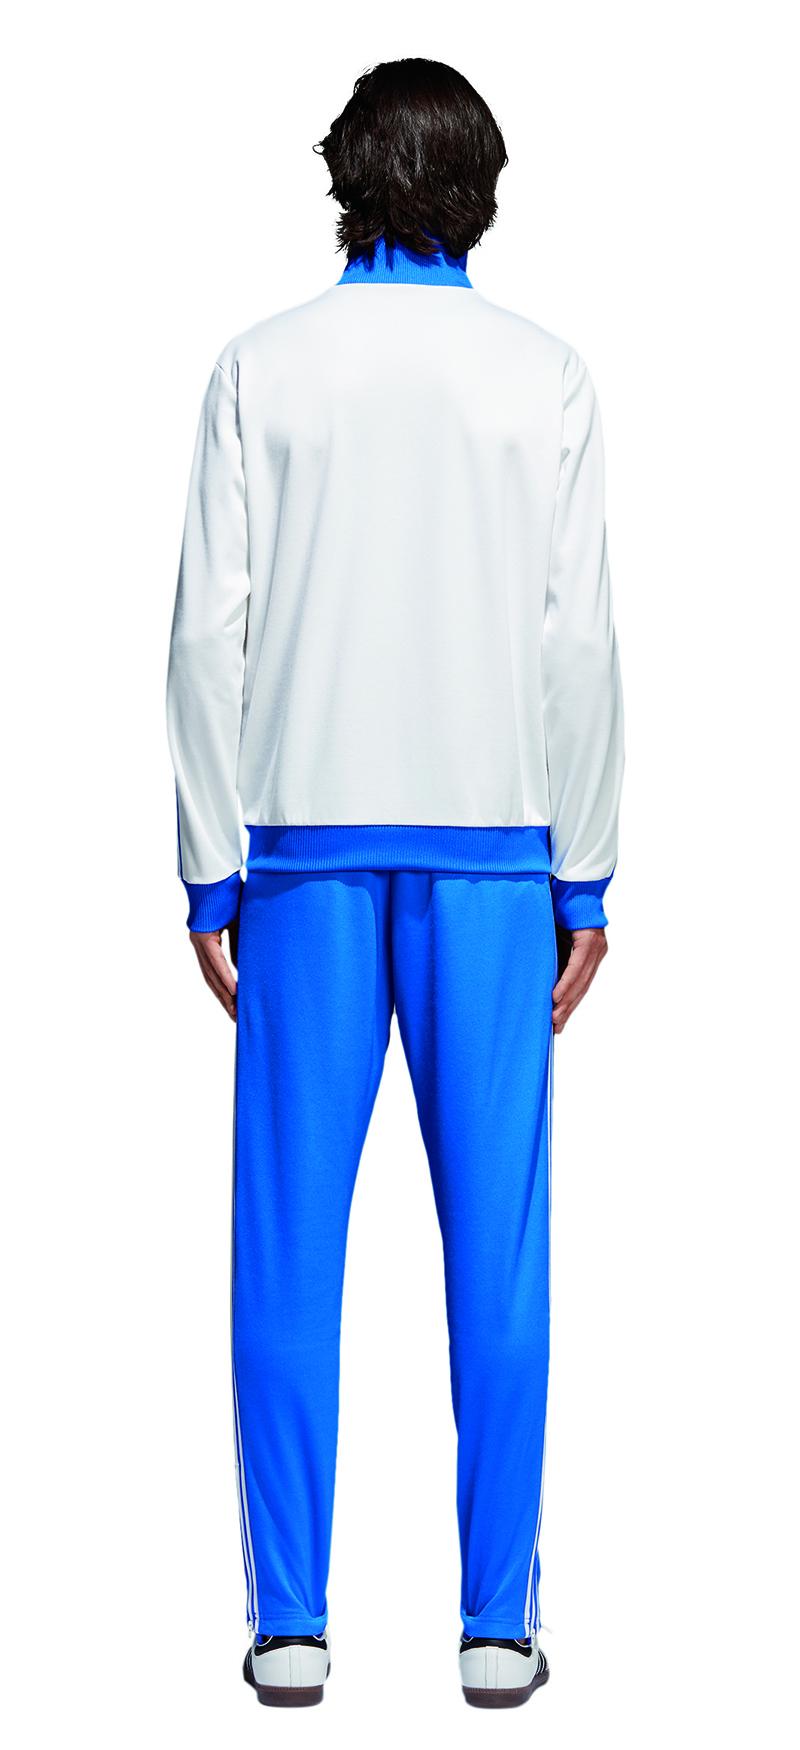 Details about Adidas Originals Franz Beckenbauer Tracksuit White Tracksuit Bottoms